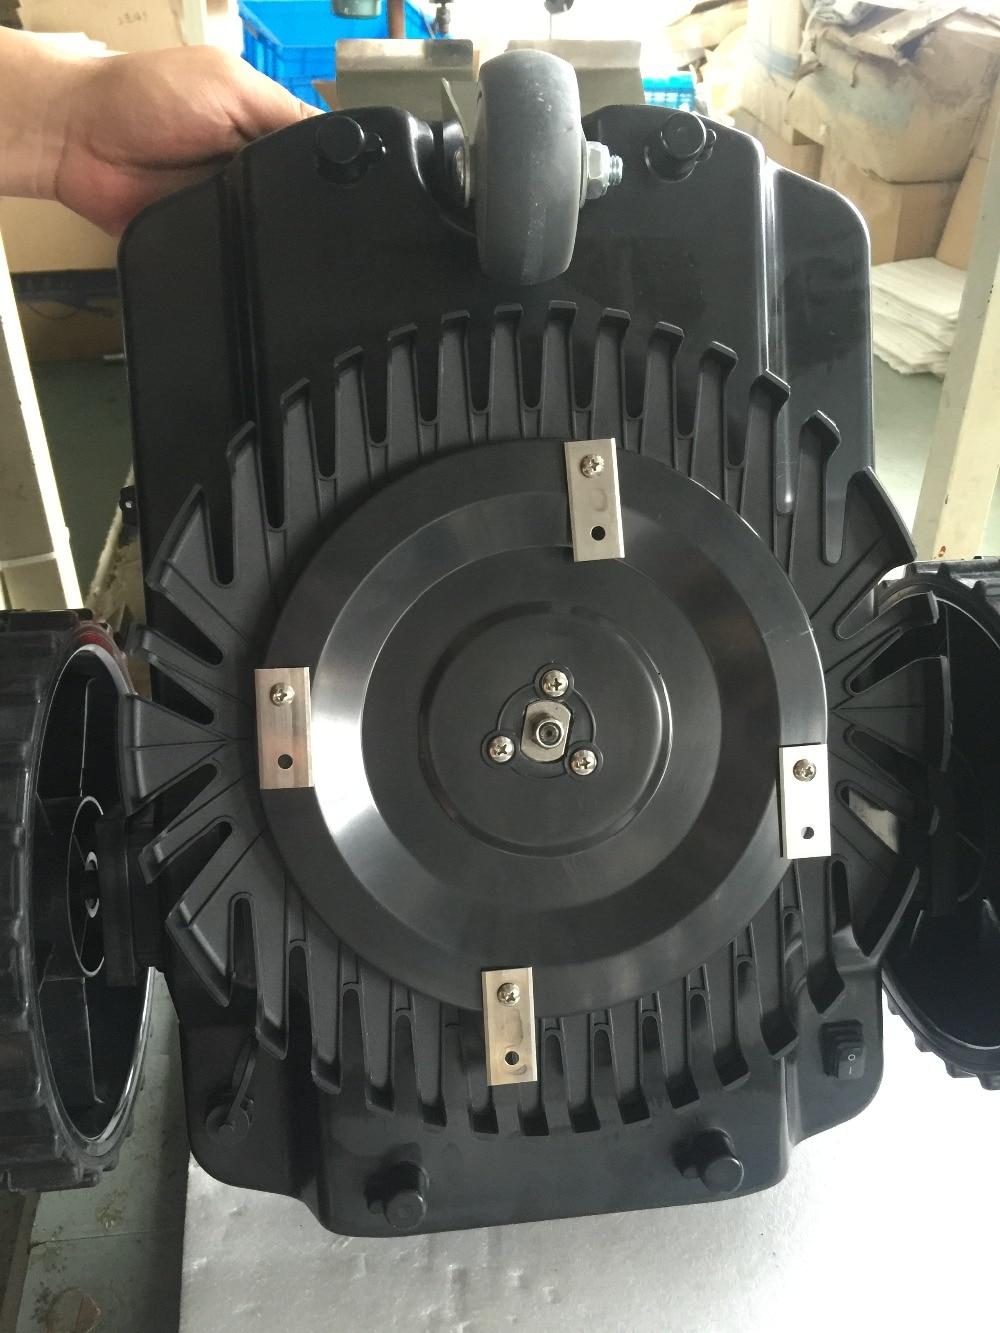 20pcs Blade,Knife For Robot Lawn Mower E1600T/E1600/E1800T/E1800/E1800S/S520/S510